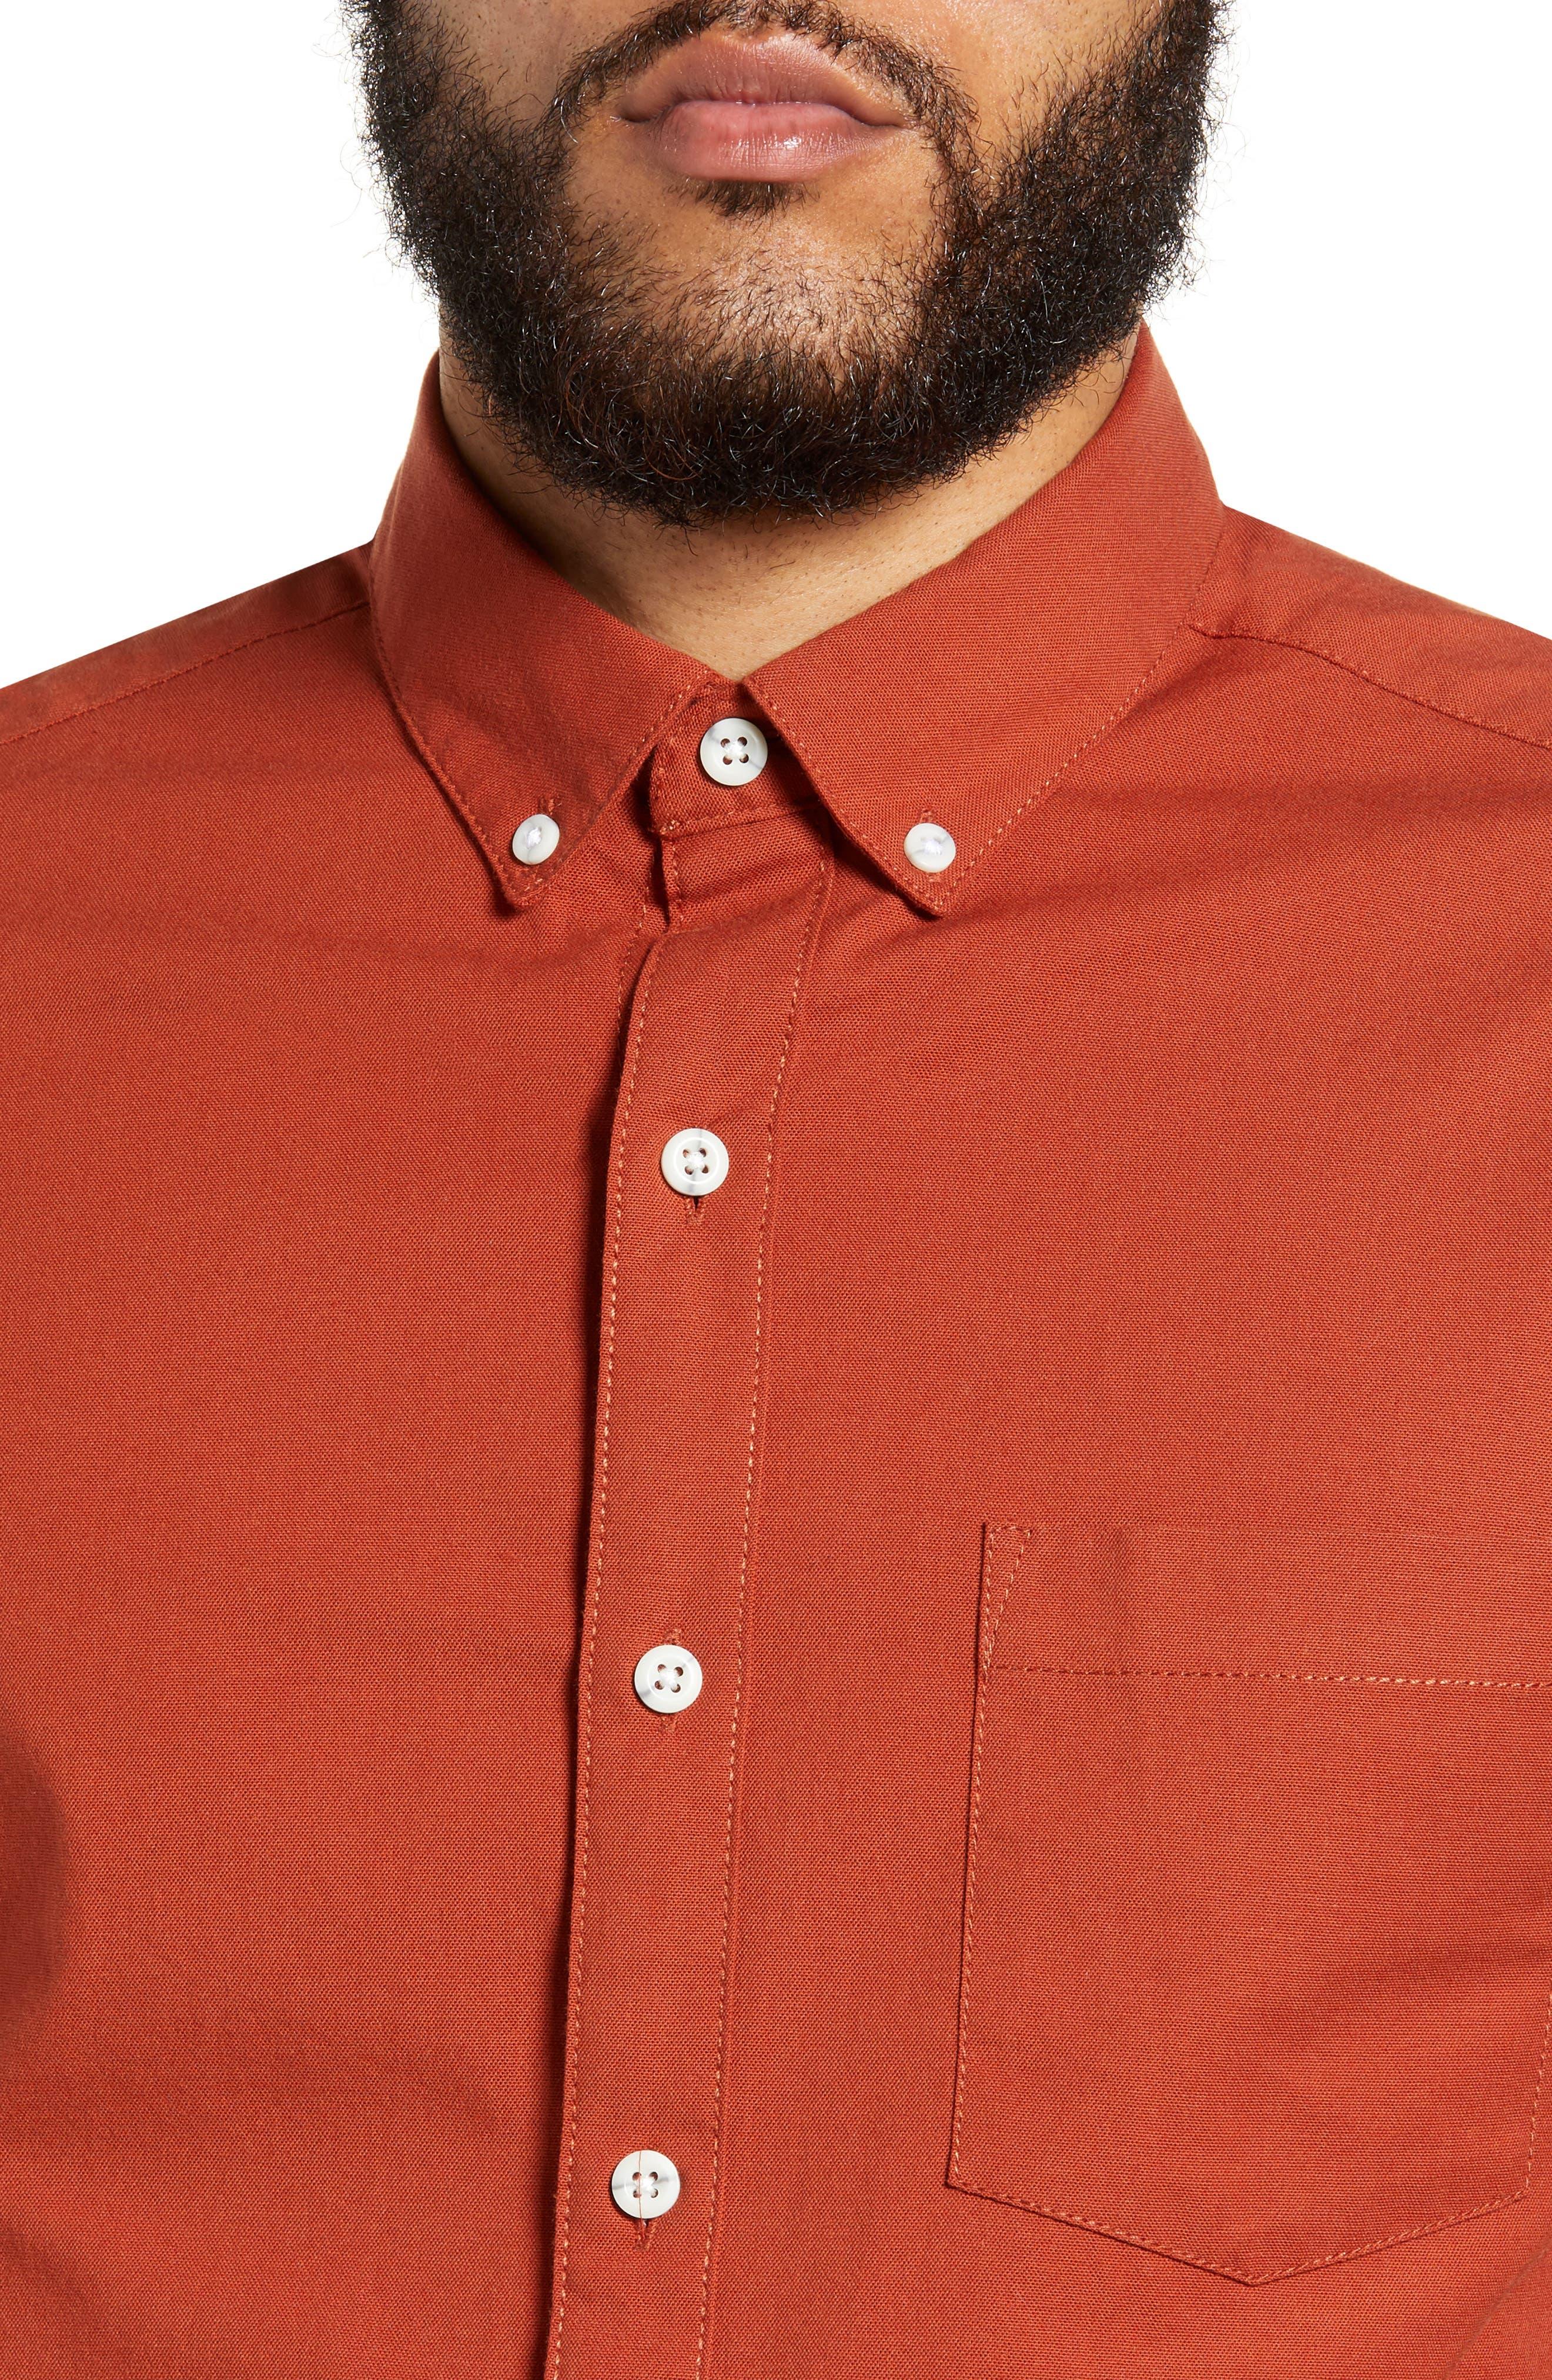 TOPMAN,                             Classic Fit Oxford Shirt,                             Alternate thumbnail 2, color,                             BROWN